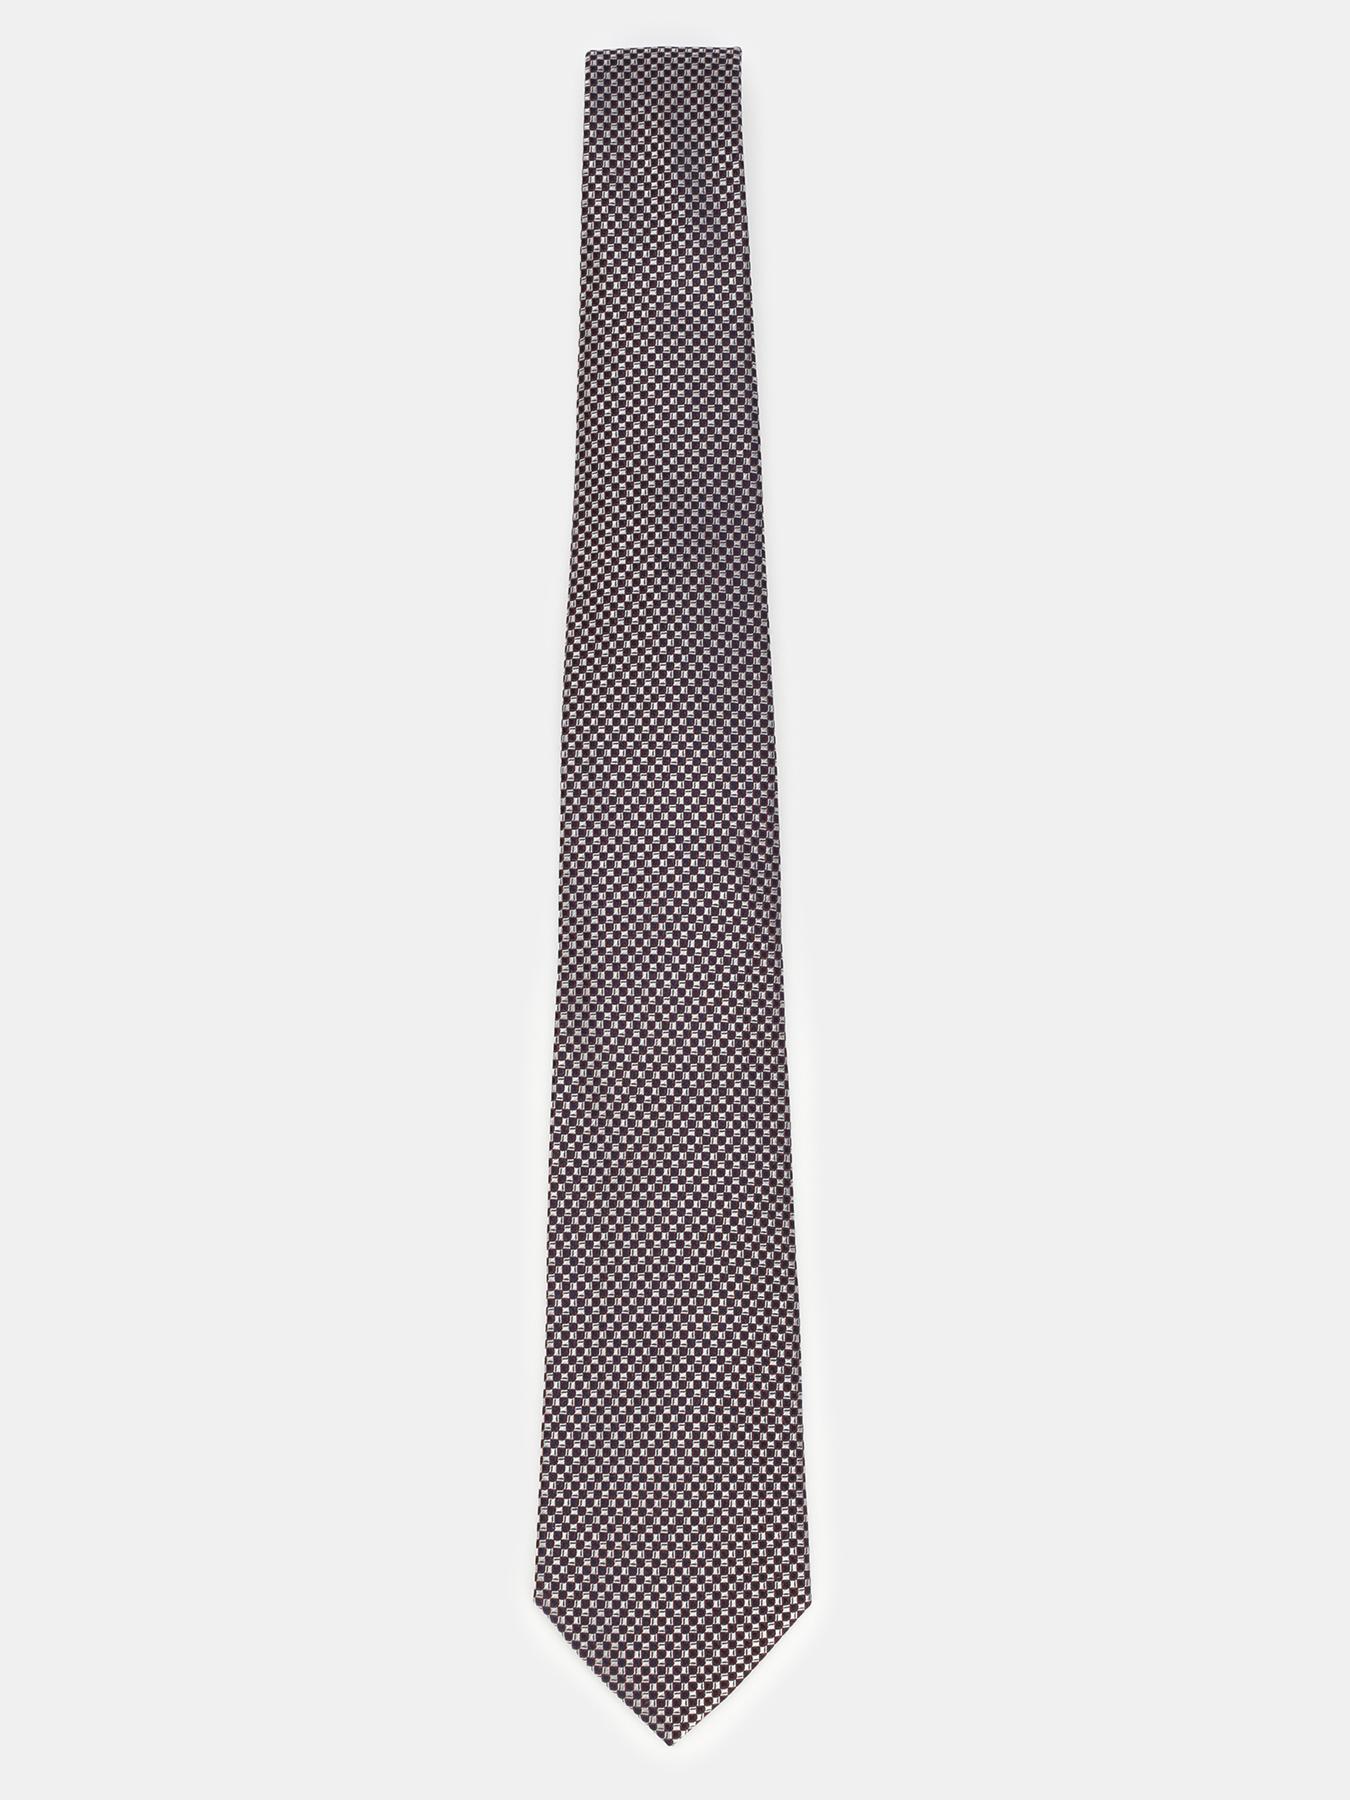 Галстуки Ritter Галстук галстук ritter шелковый галстук